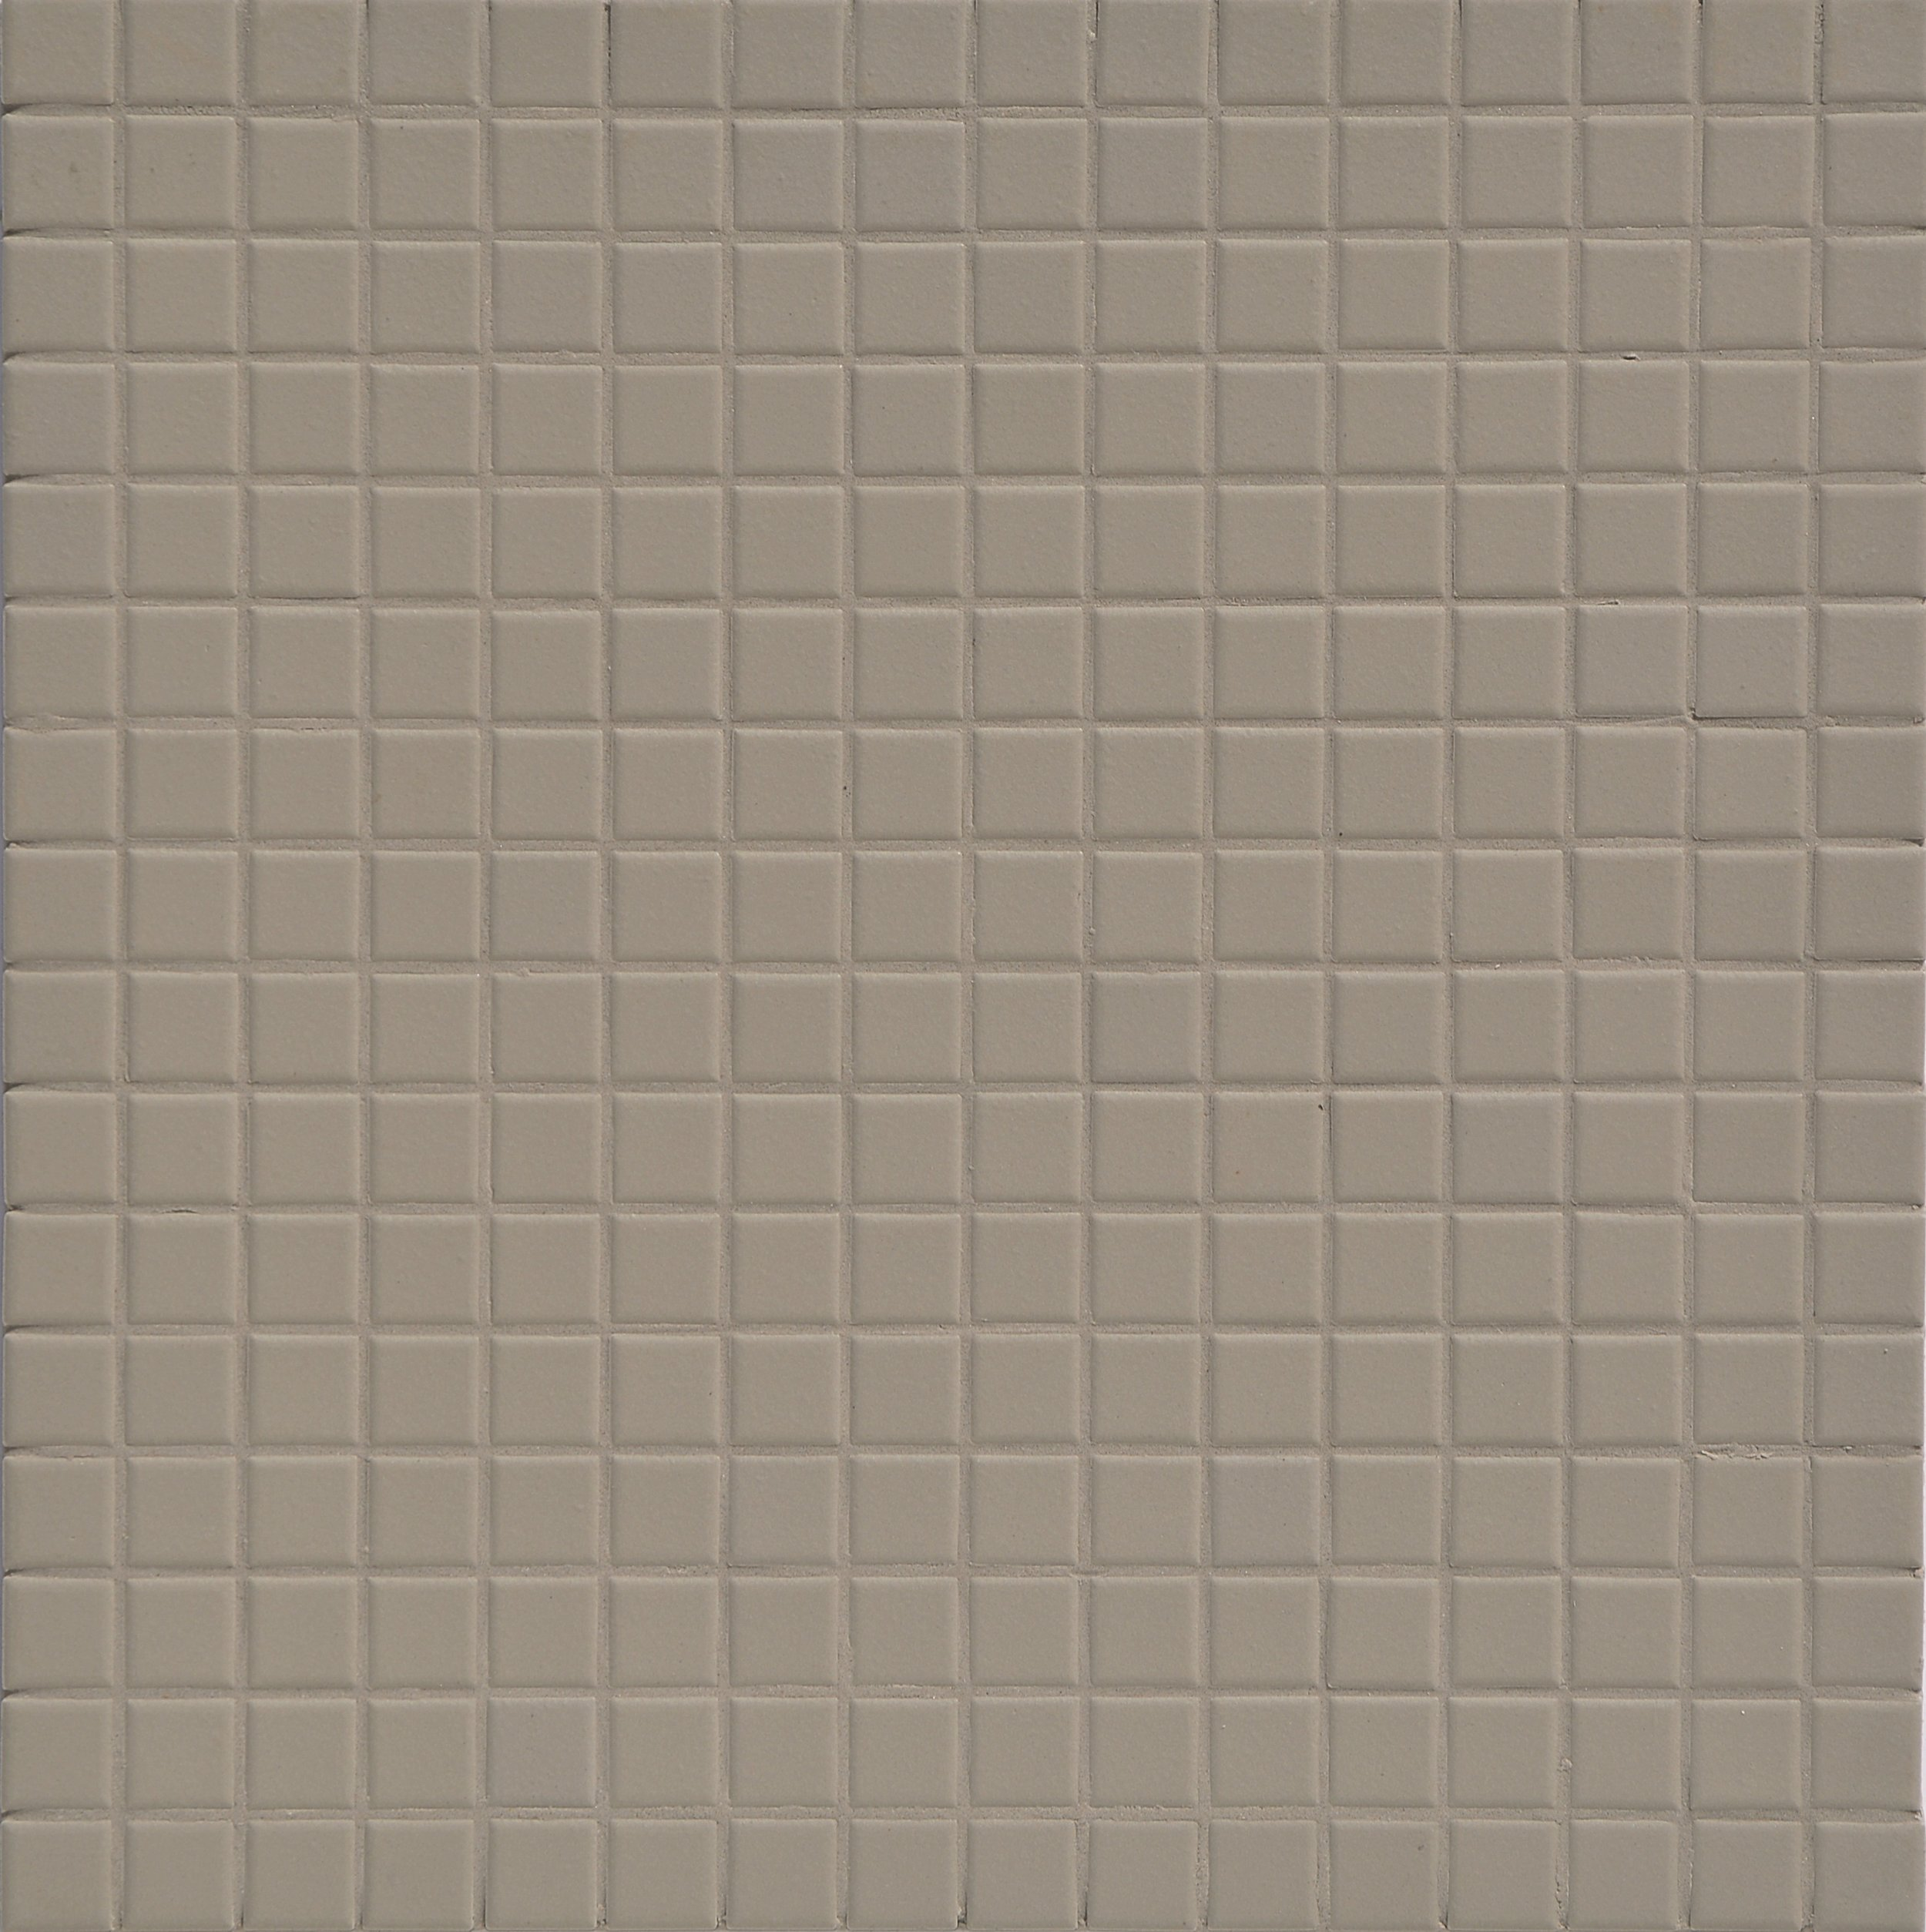 Mosaico_Clay_FOGLIO.jpg